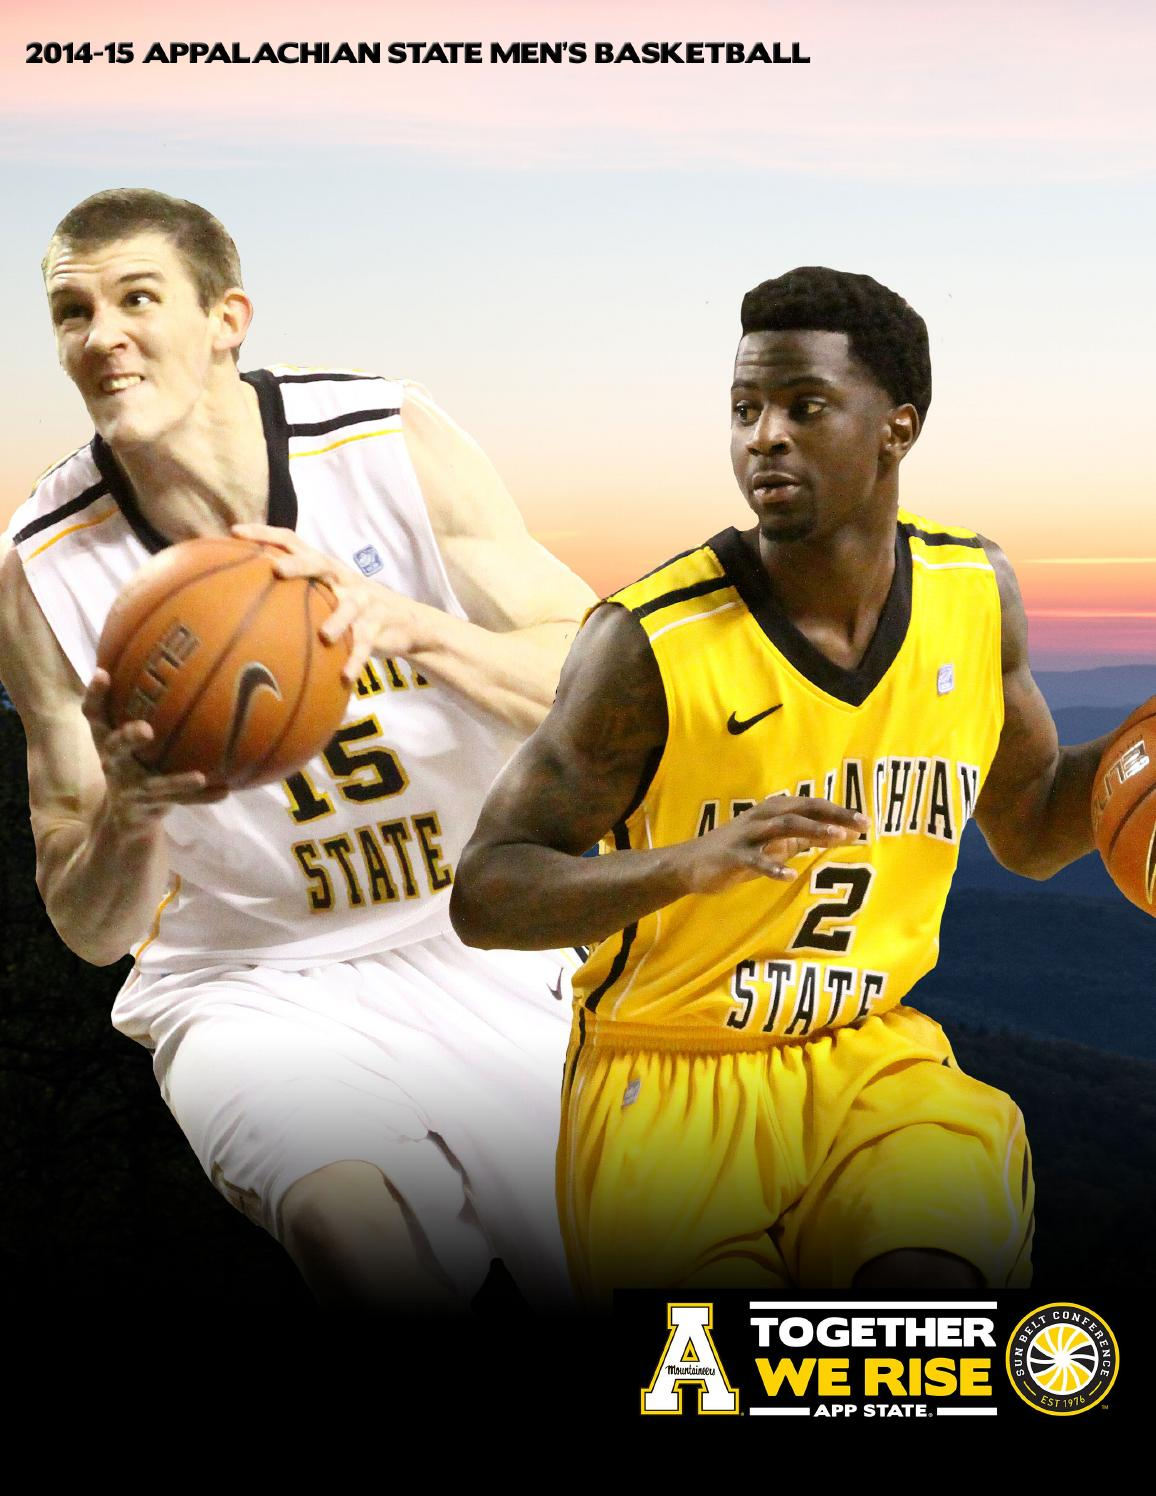 1c5138164c6 2012-13 Appalachian State Men s Basketball Yearbook by Appalachian State  University Athletics - issuu